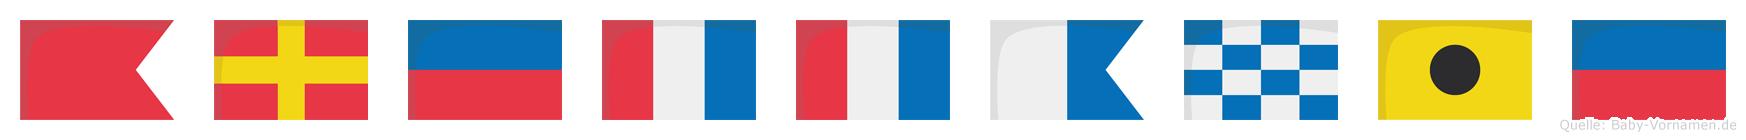 Brettanie im Flaggenalphabet